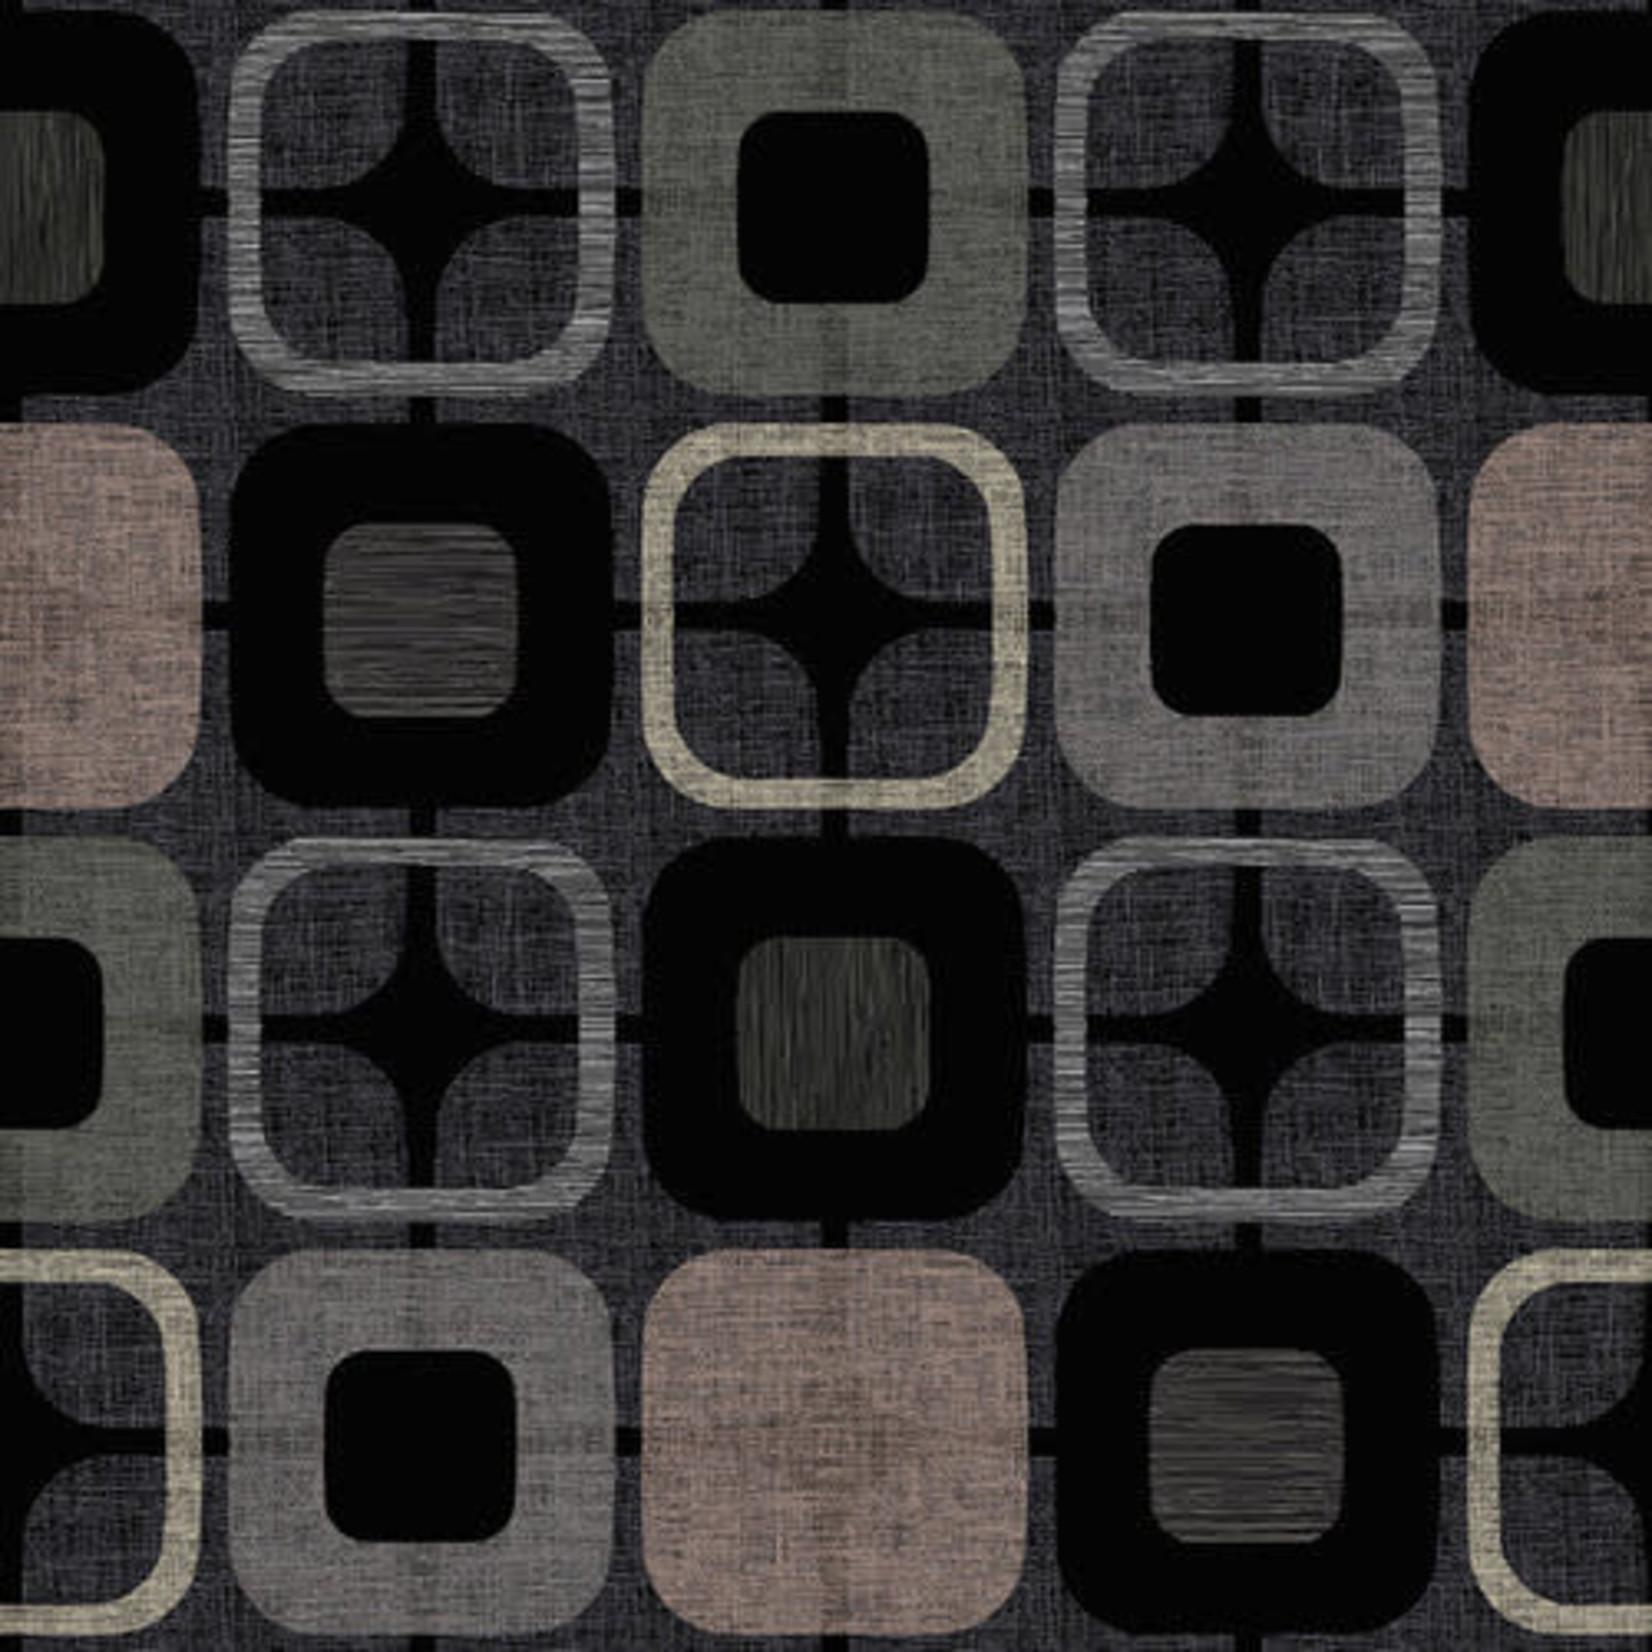 Blank Quilting Geo Square - Black